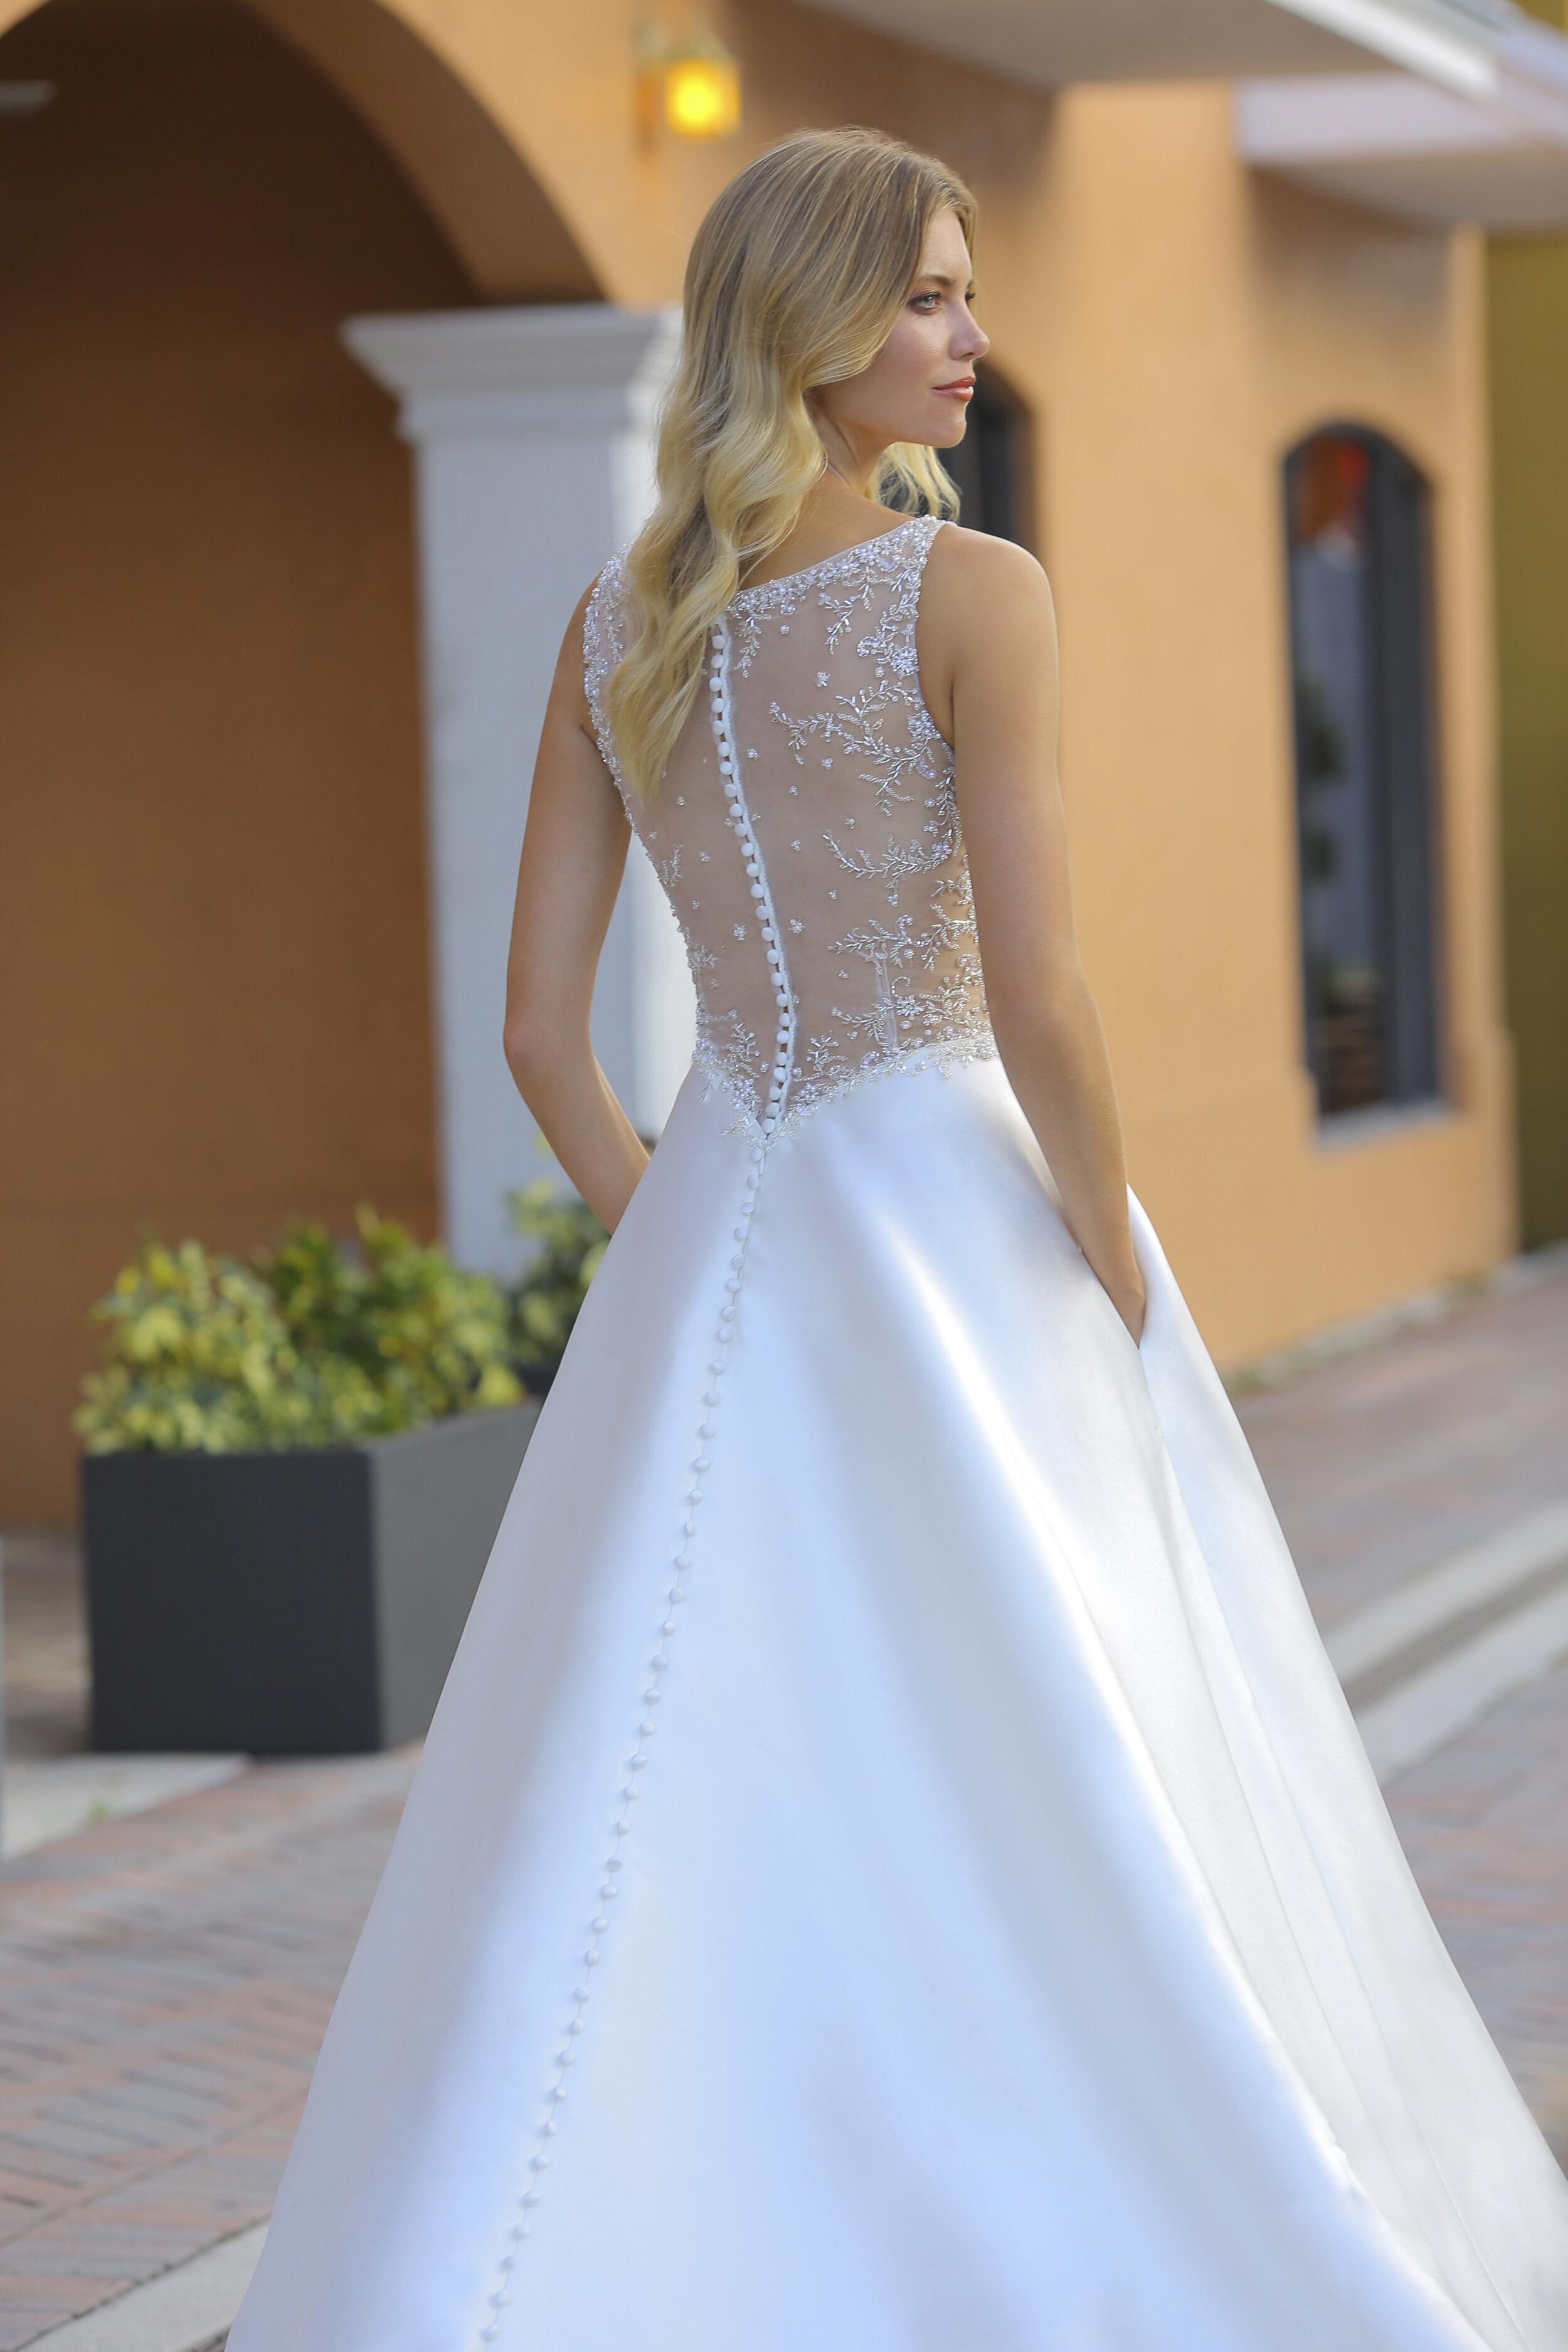 randy fenoli audrey dress, OFF 73%,Best